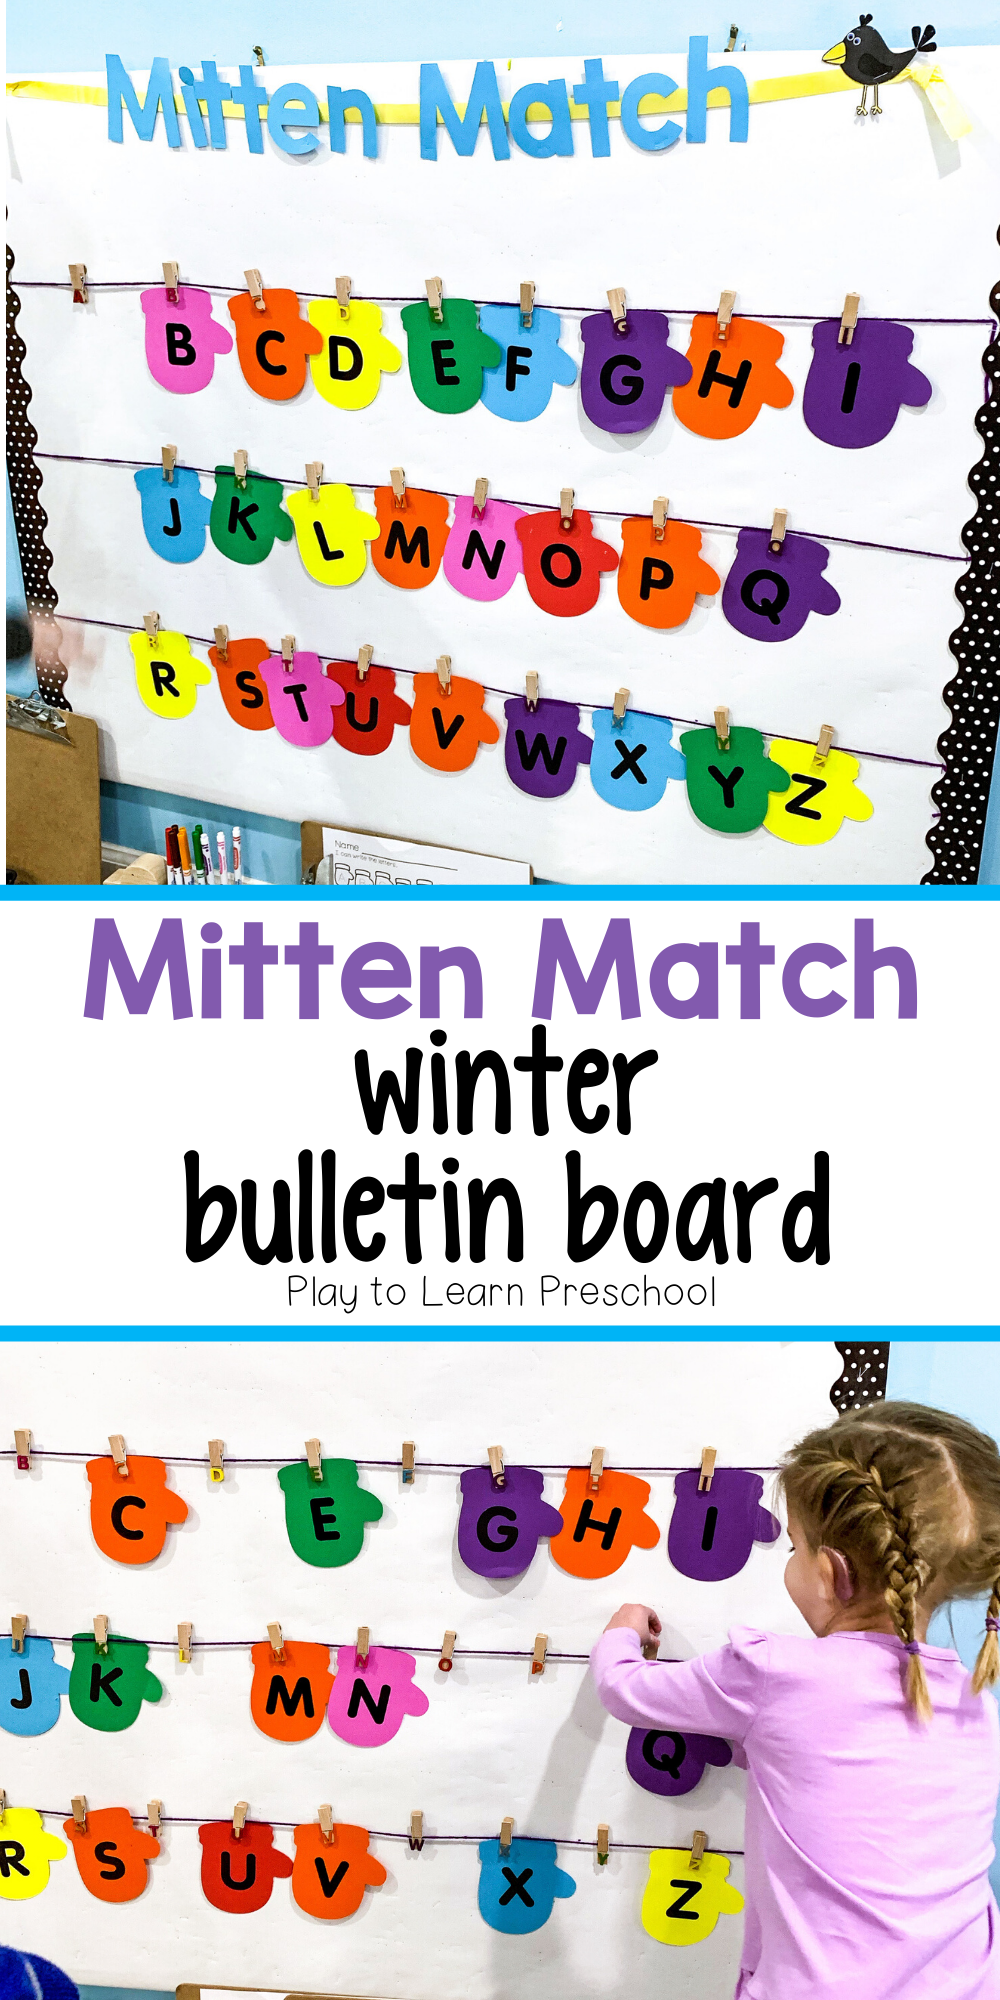 Mitten Matching Bulletin Board for Preschool